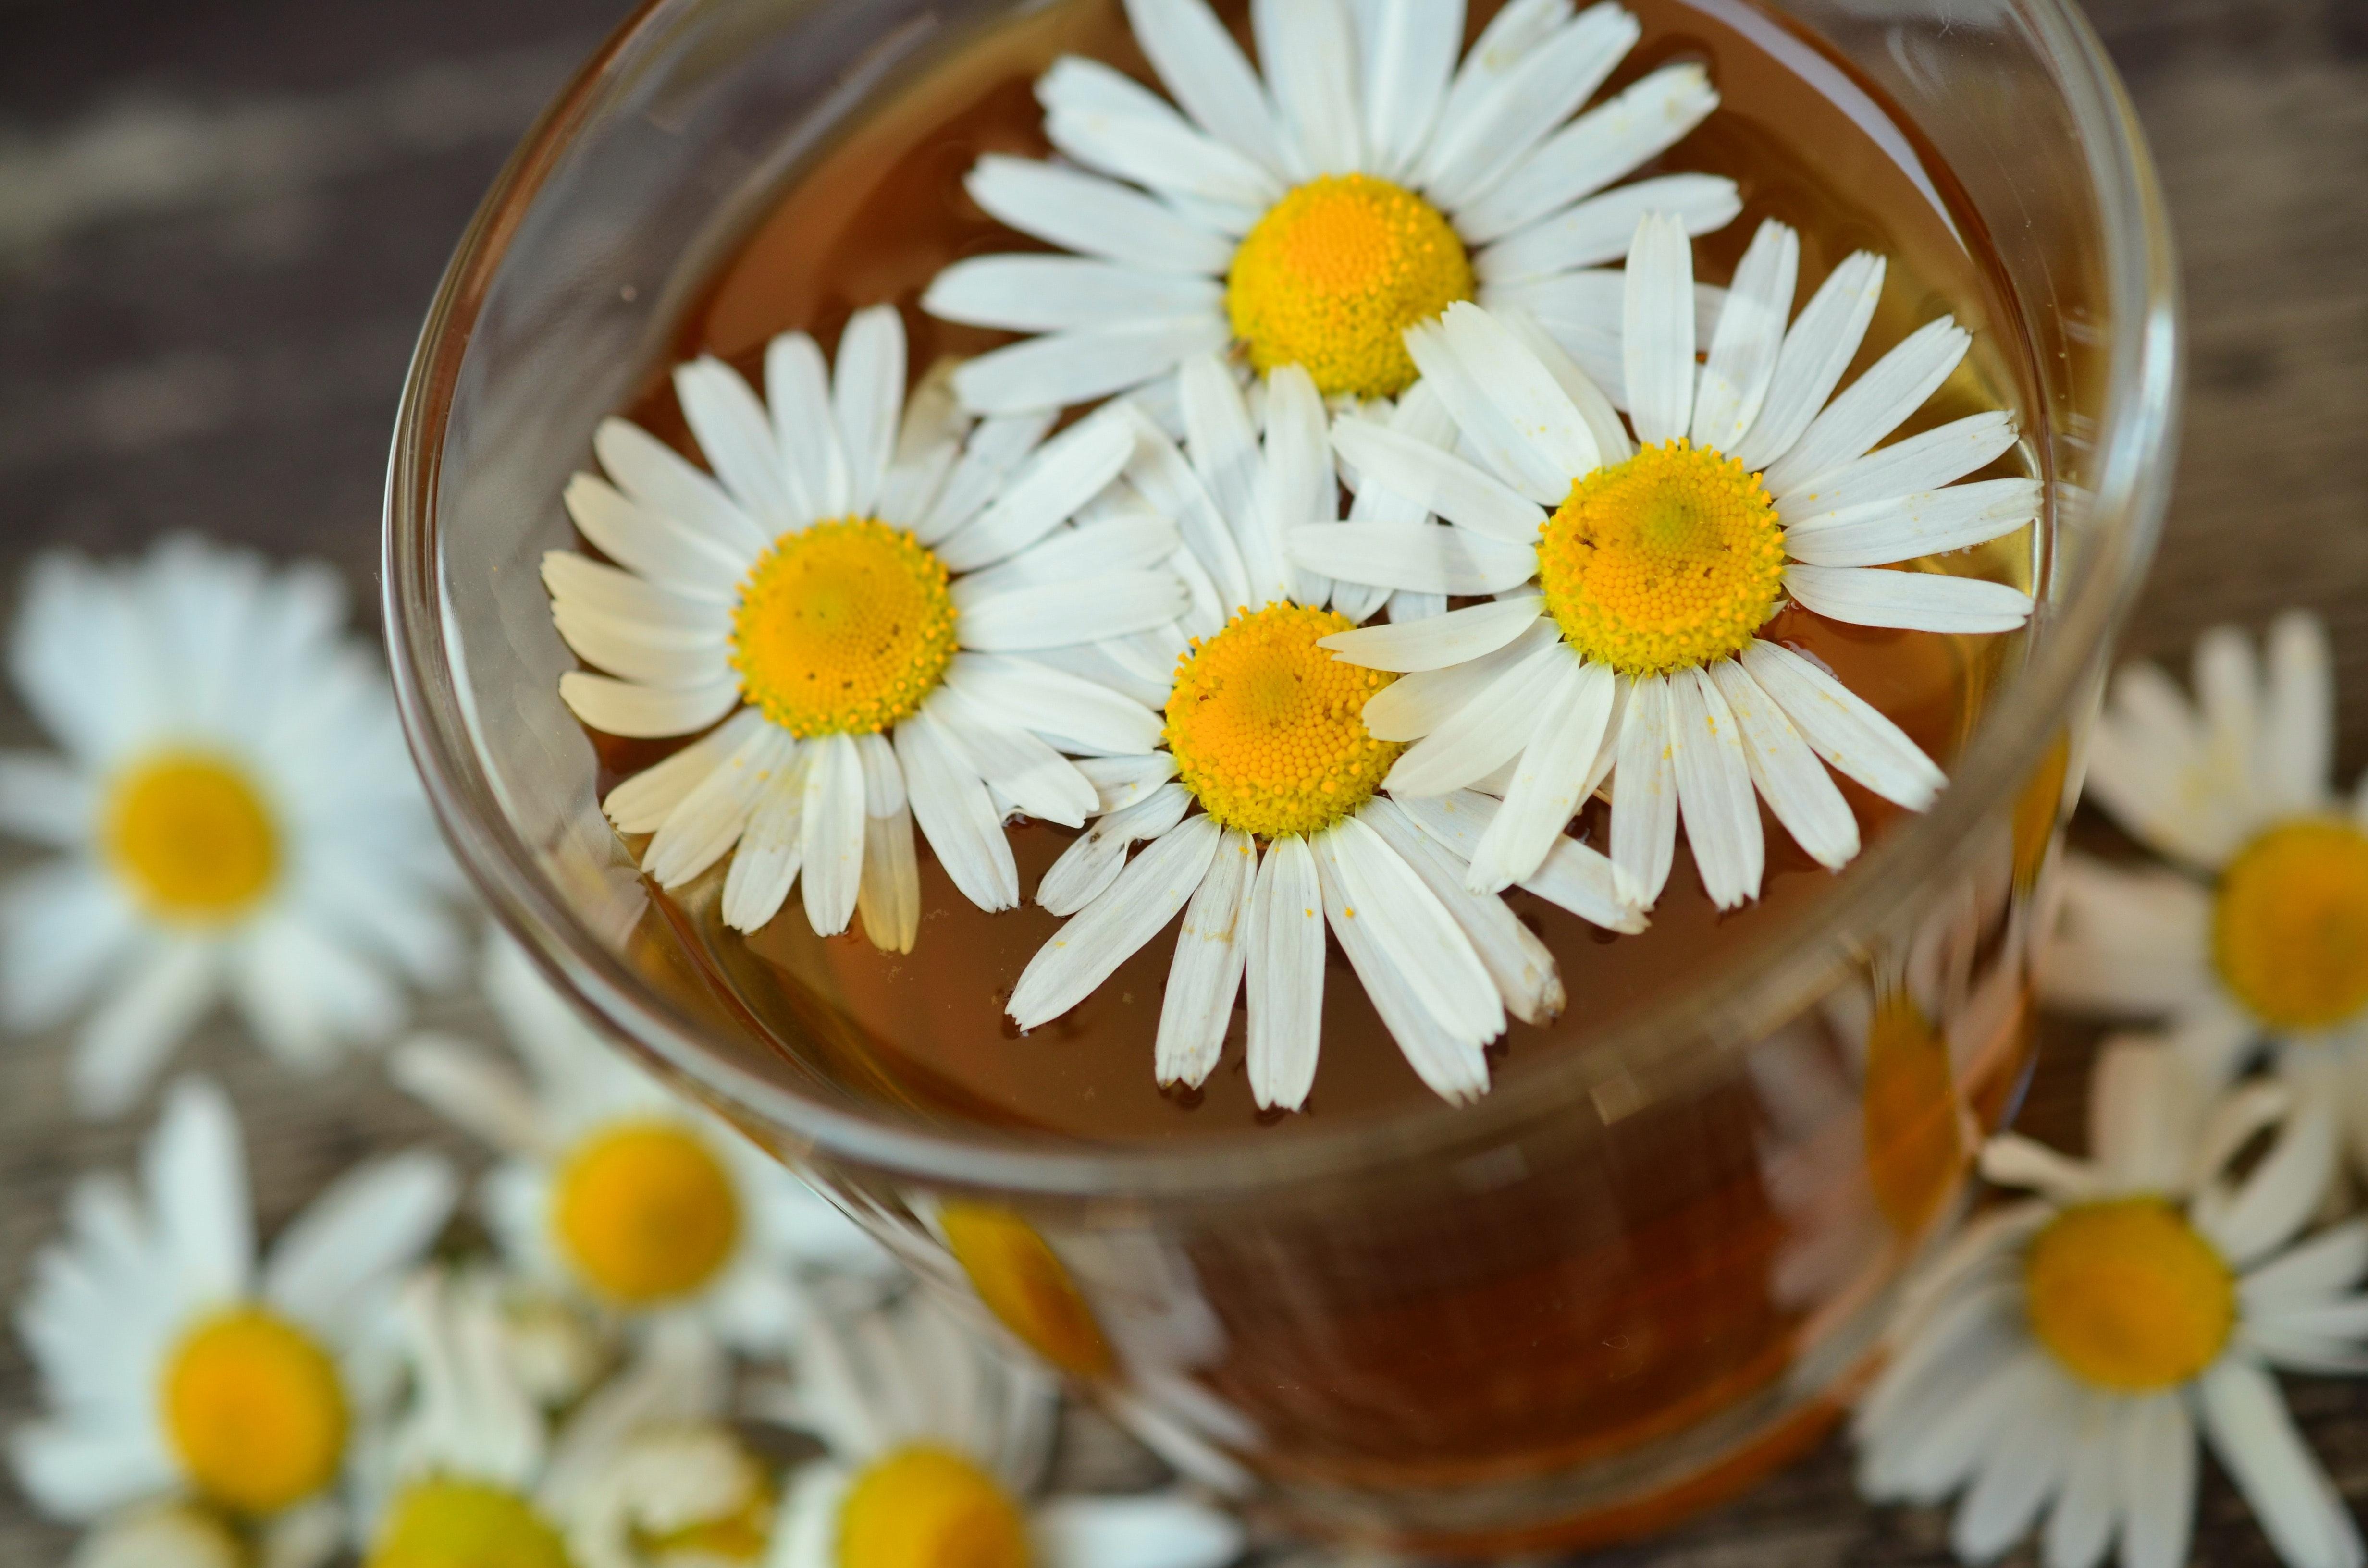 beverage-bloom-blossom-34696.jpg